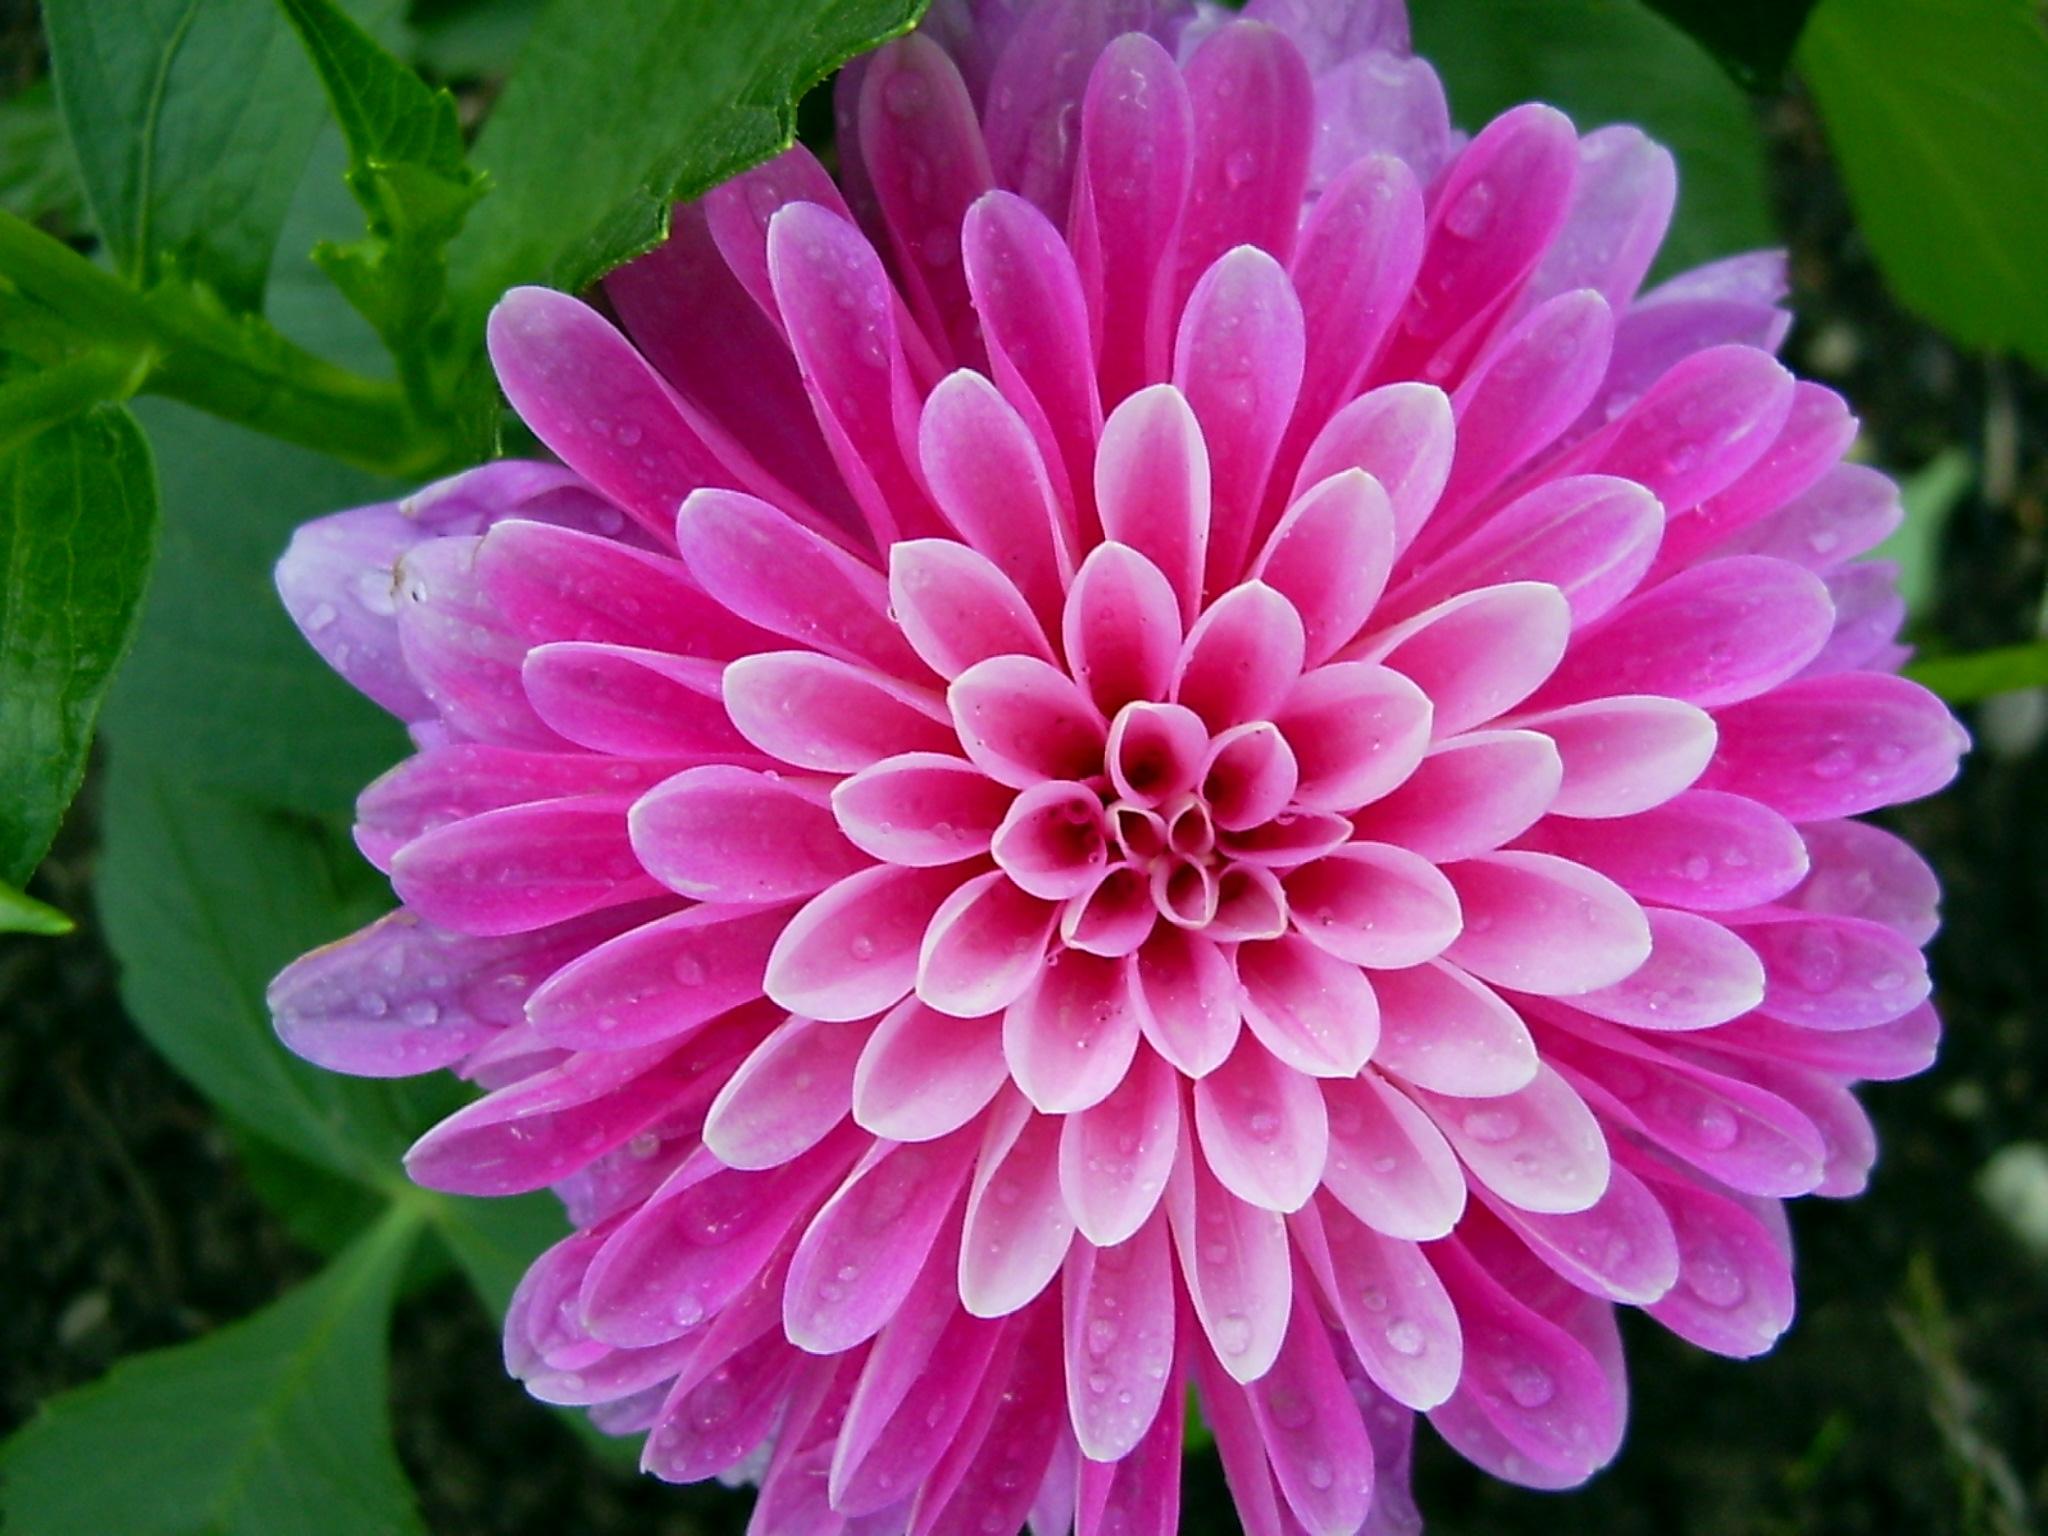 Flowers From India 4k Hd Desktop Wallpapers For Desktop Smartphone